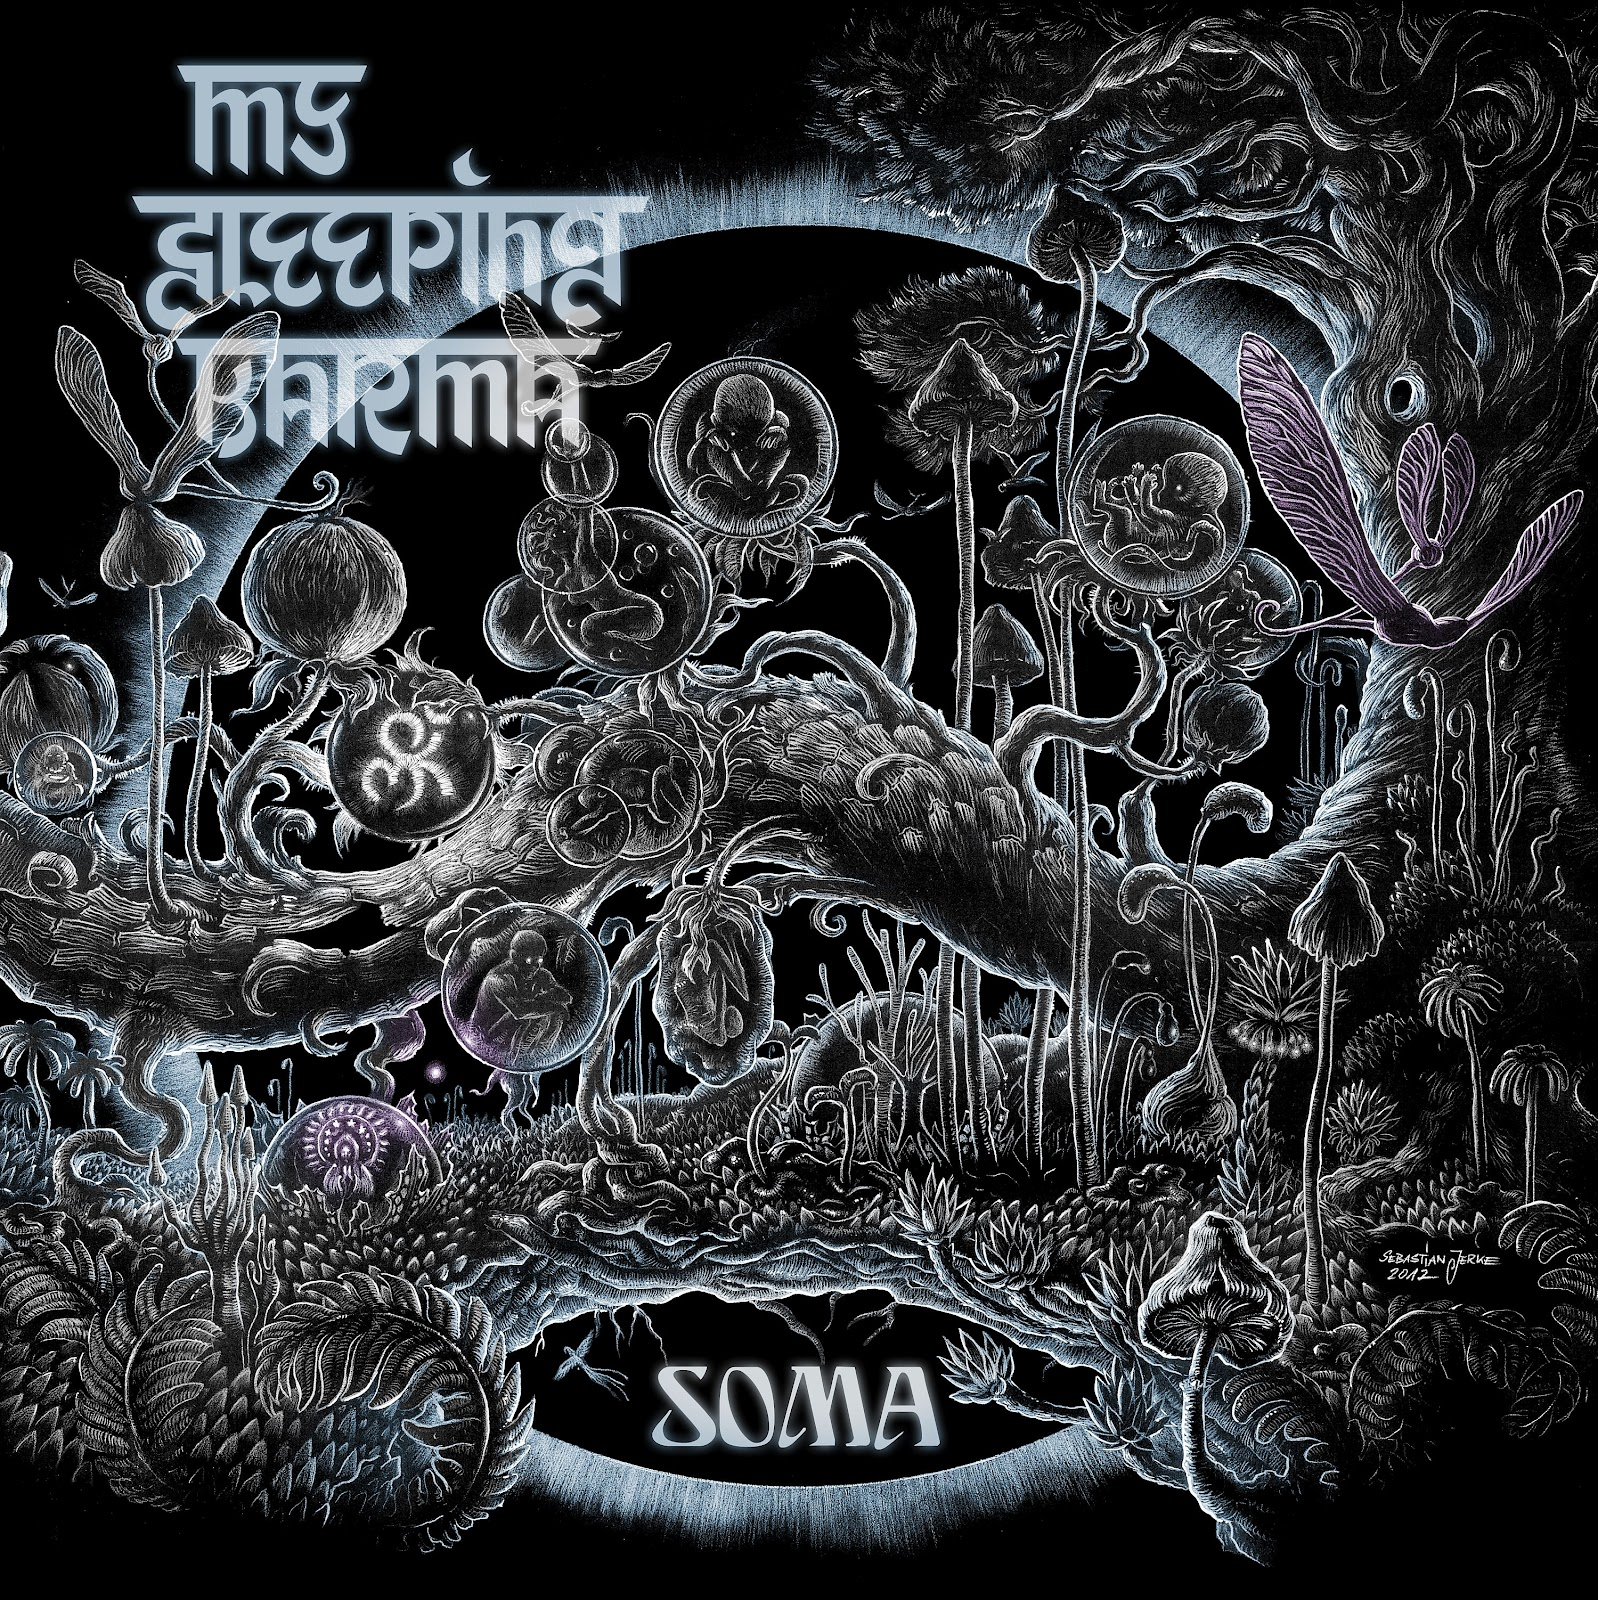 Soma (My Sleeping Karma)